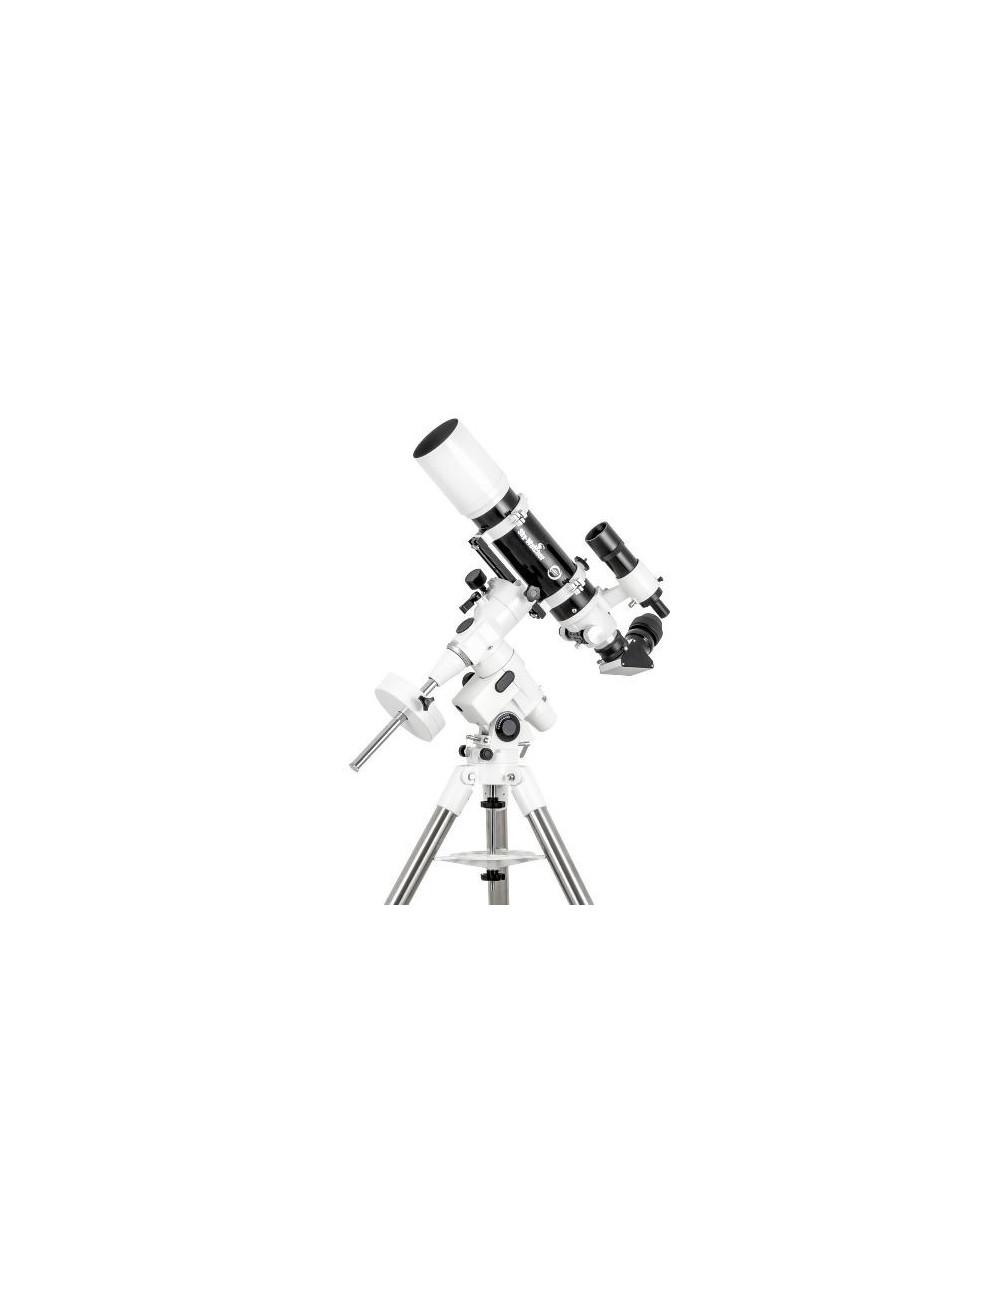 Lunette Sky-Watcher 80ED Black Diamond sur NEQ5